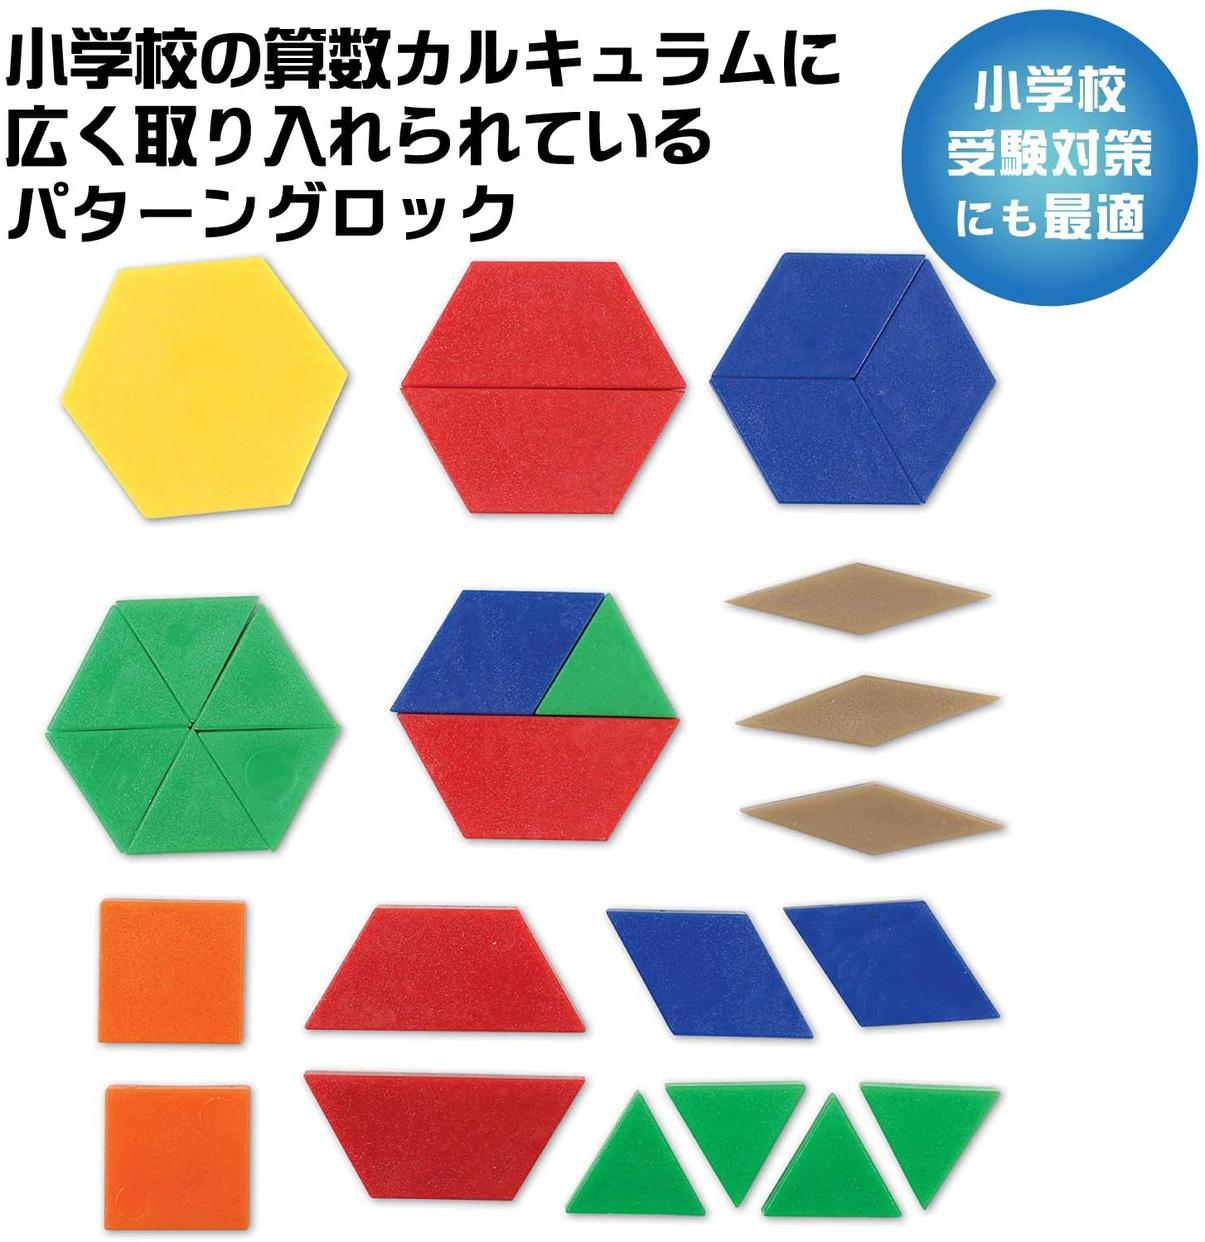 Learning Resources(ラーニングリソーシズ) パターンブロック ミニセットの商品画像6